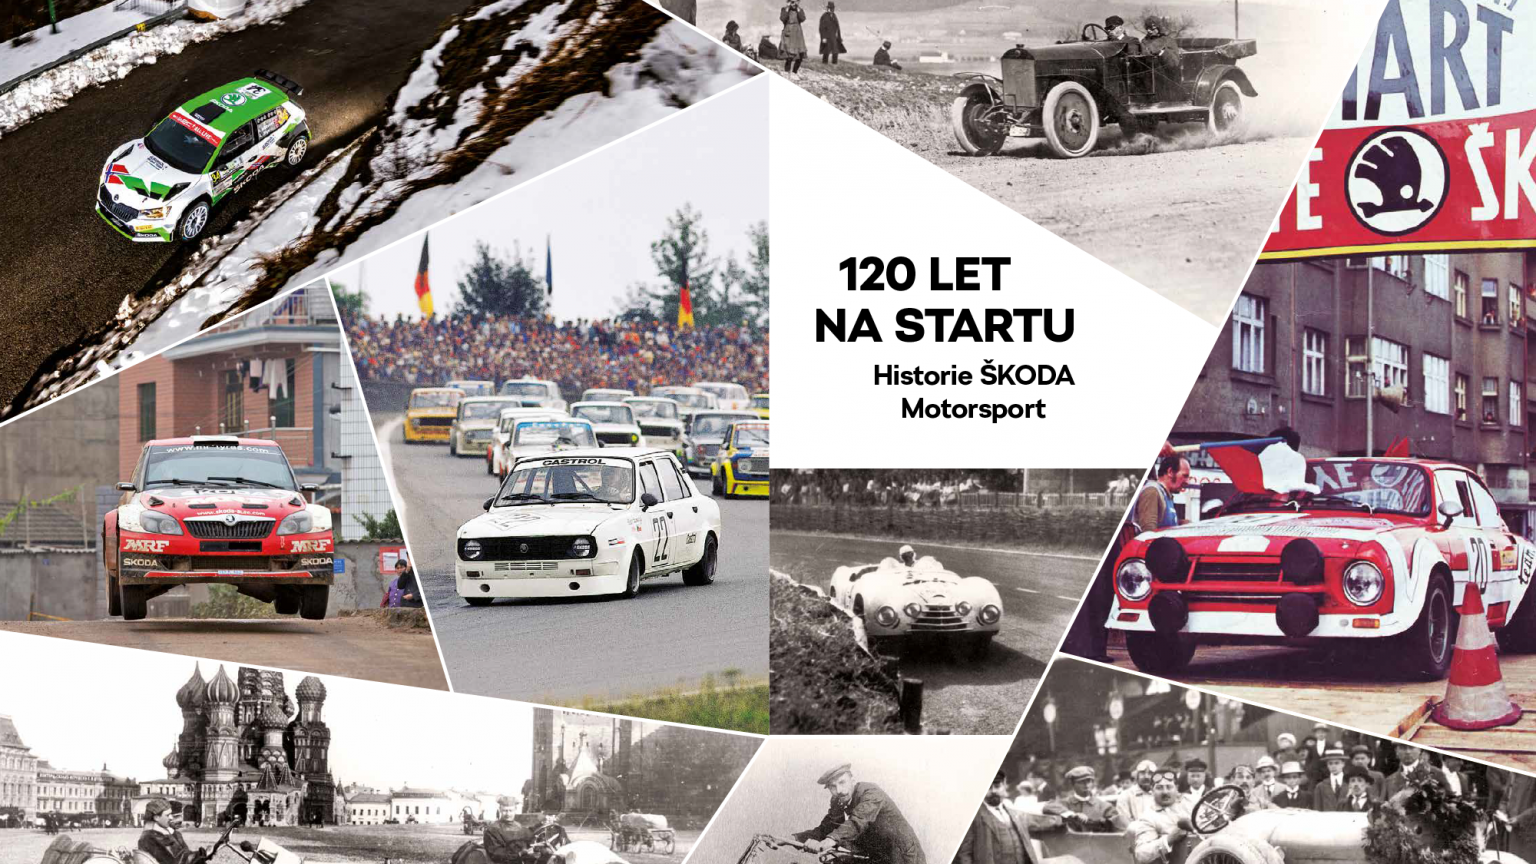 SKODA_Motorsport-120-let